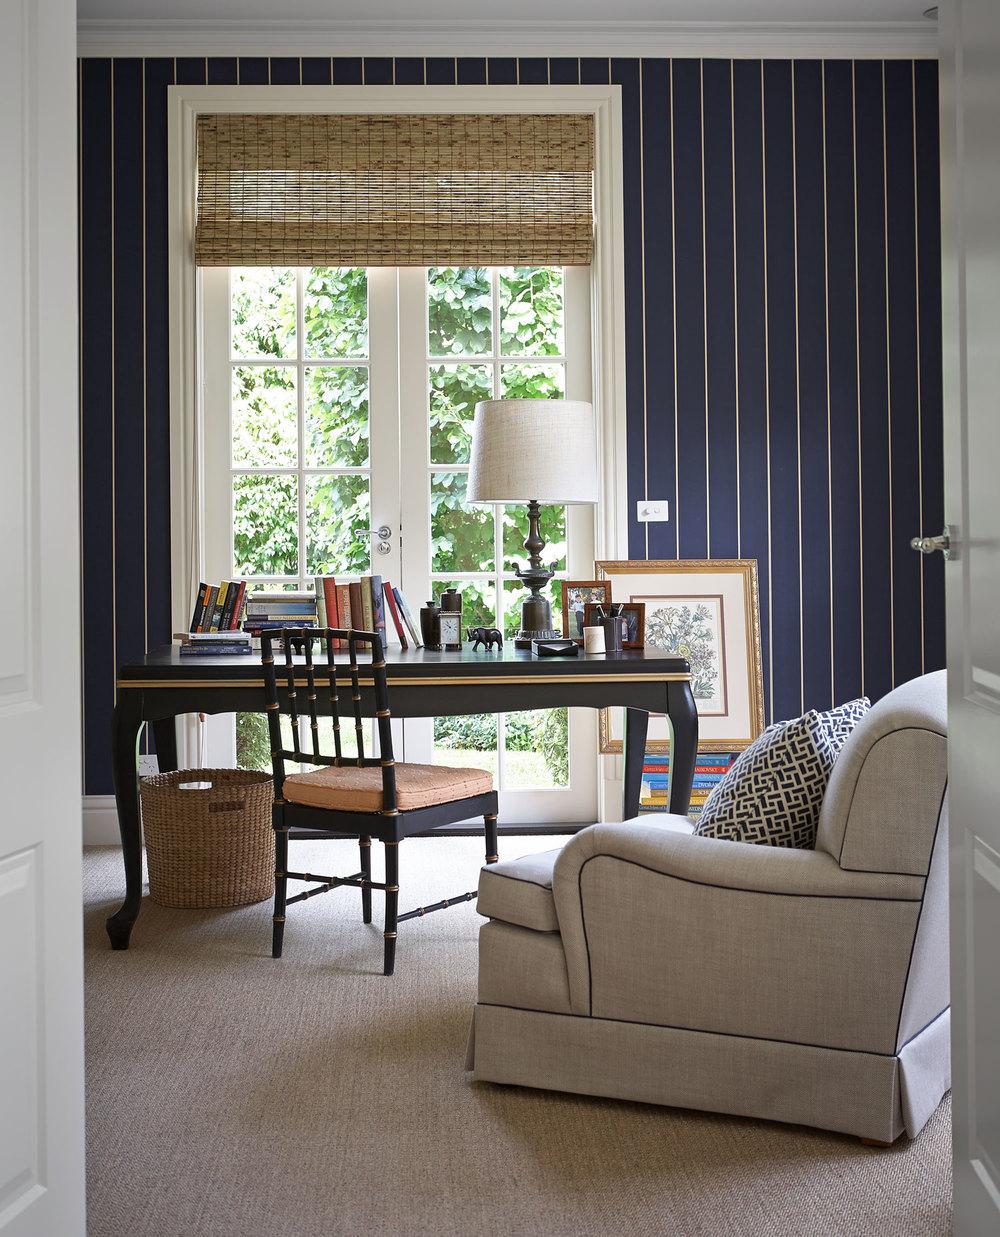 LibraryStudy Interior Design Diane Bergeron Interiors